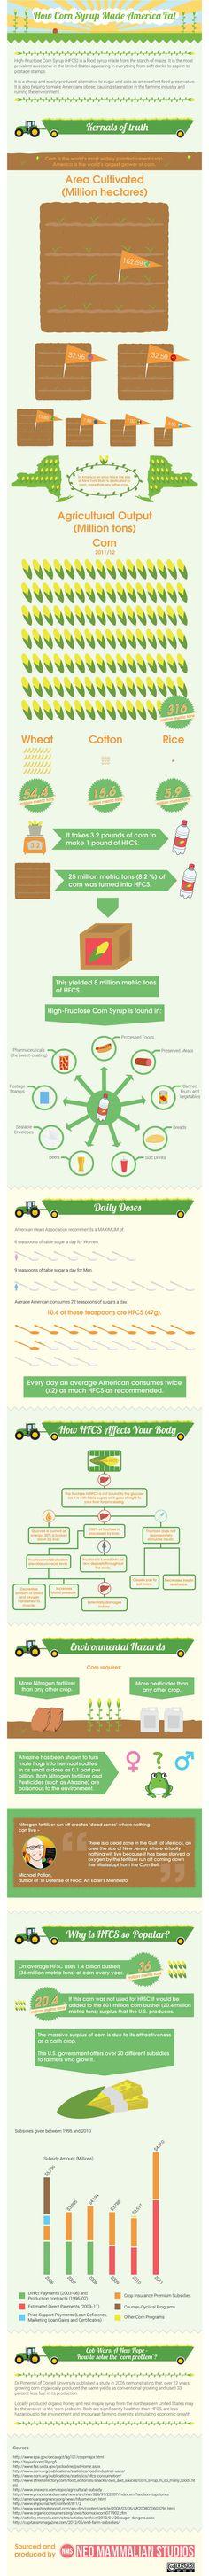 fit, corn syrup, fat infograph, healthi eat, food, highfructos corn, cornsyrup, america fat, healthi nutrit